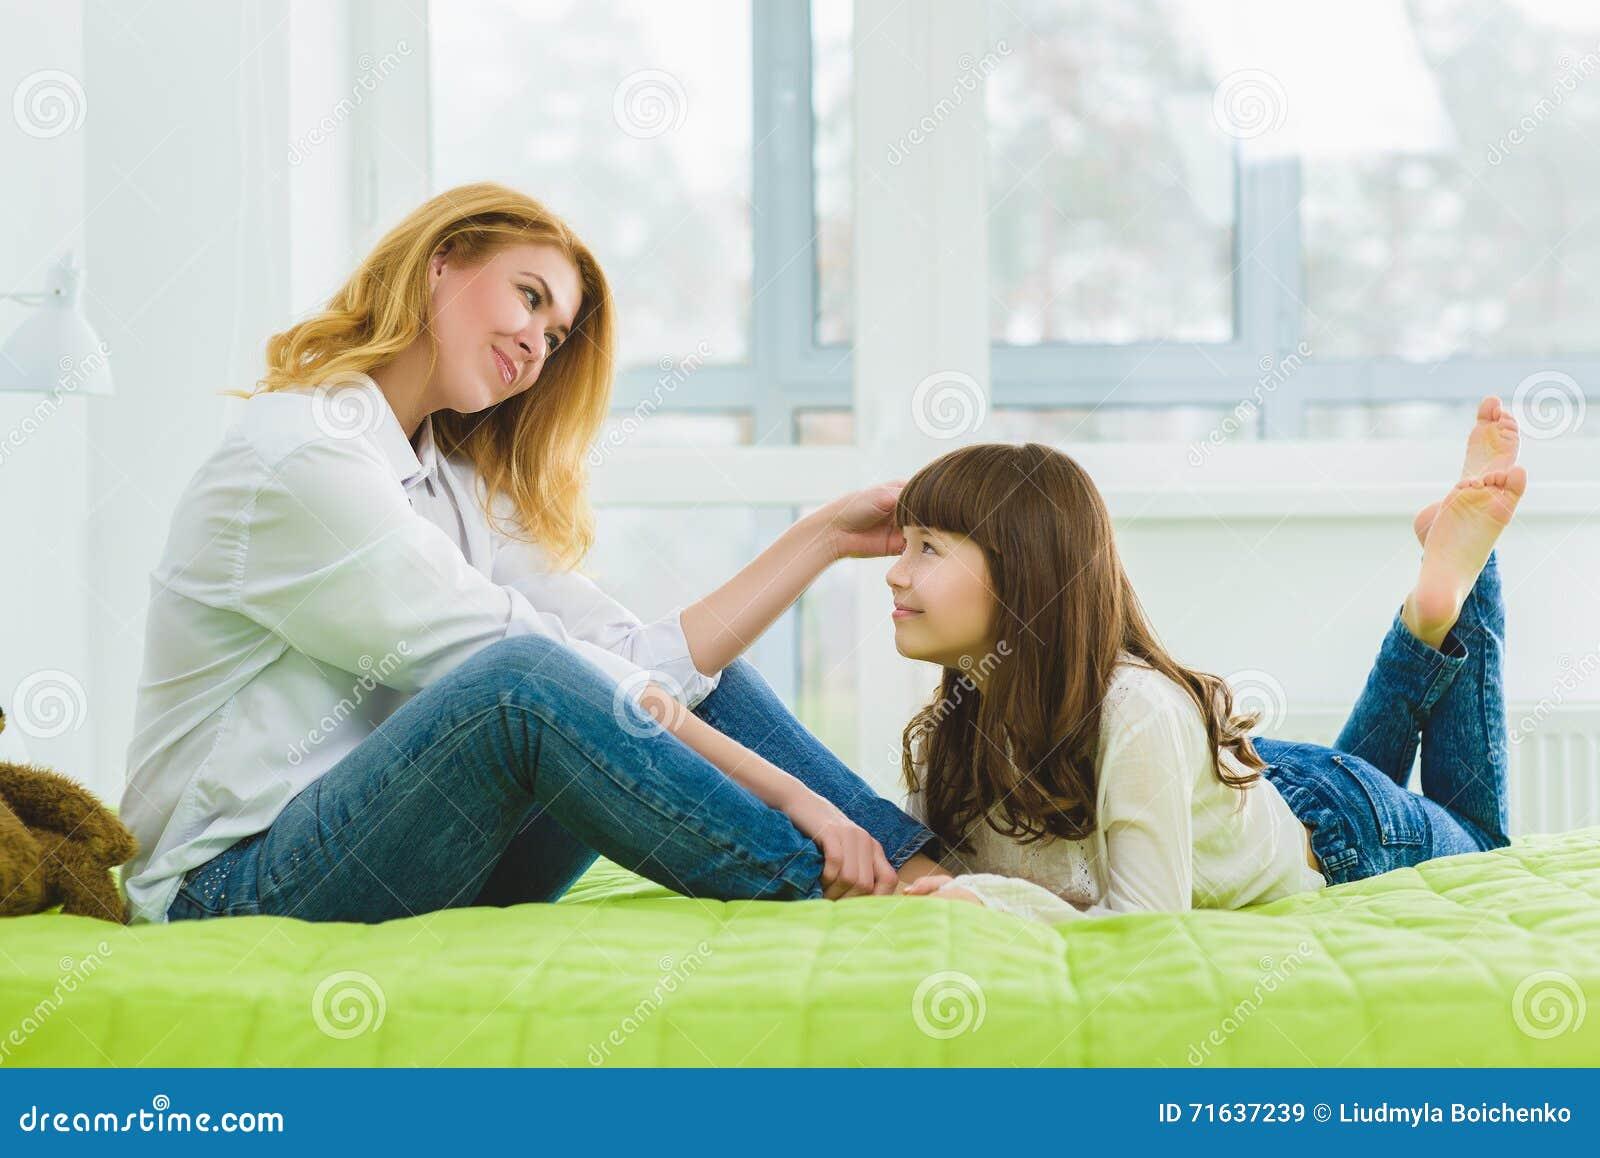 Husband caught stroking daughters clitoris